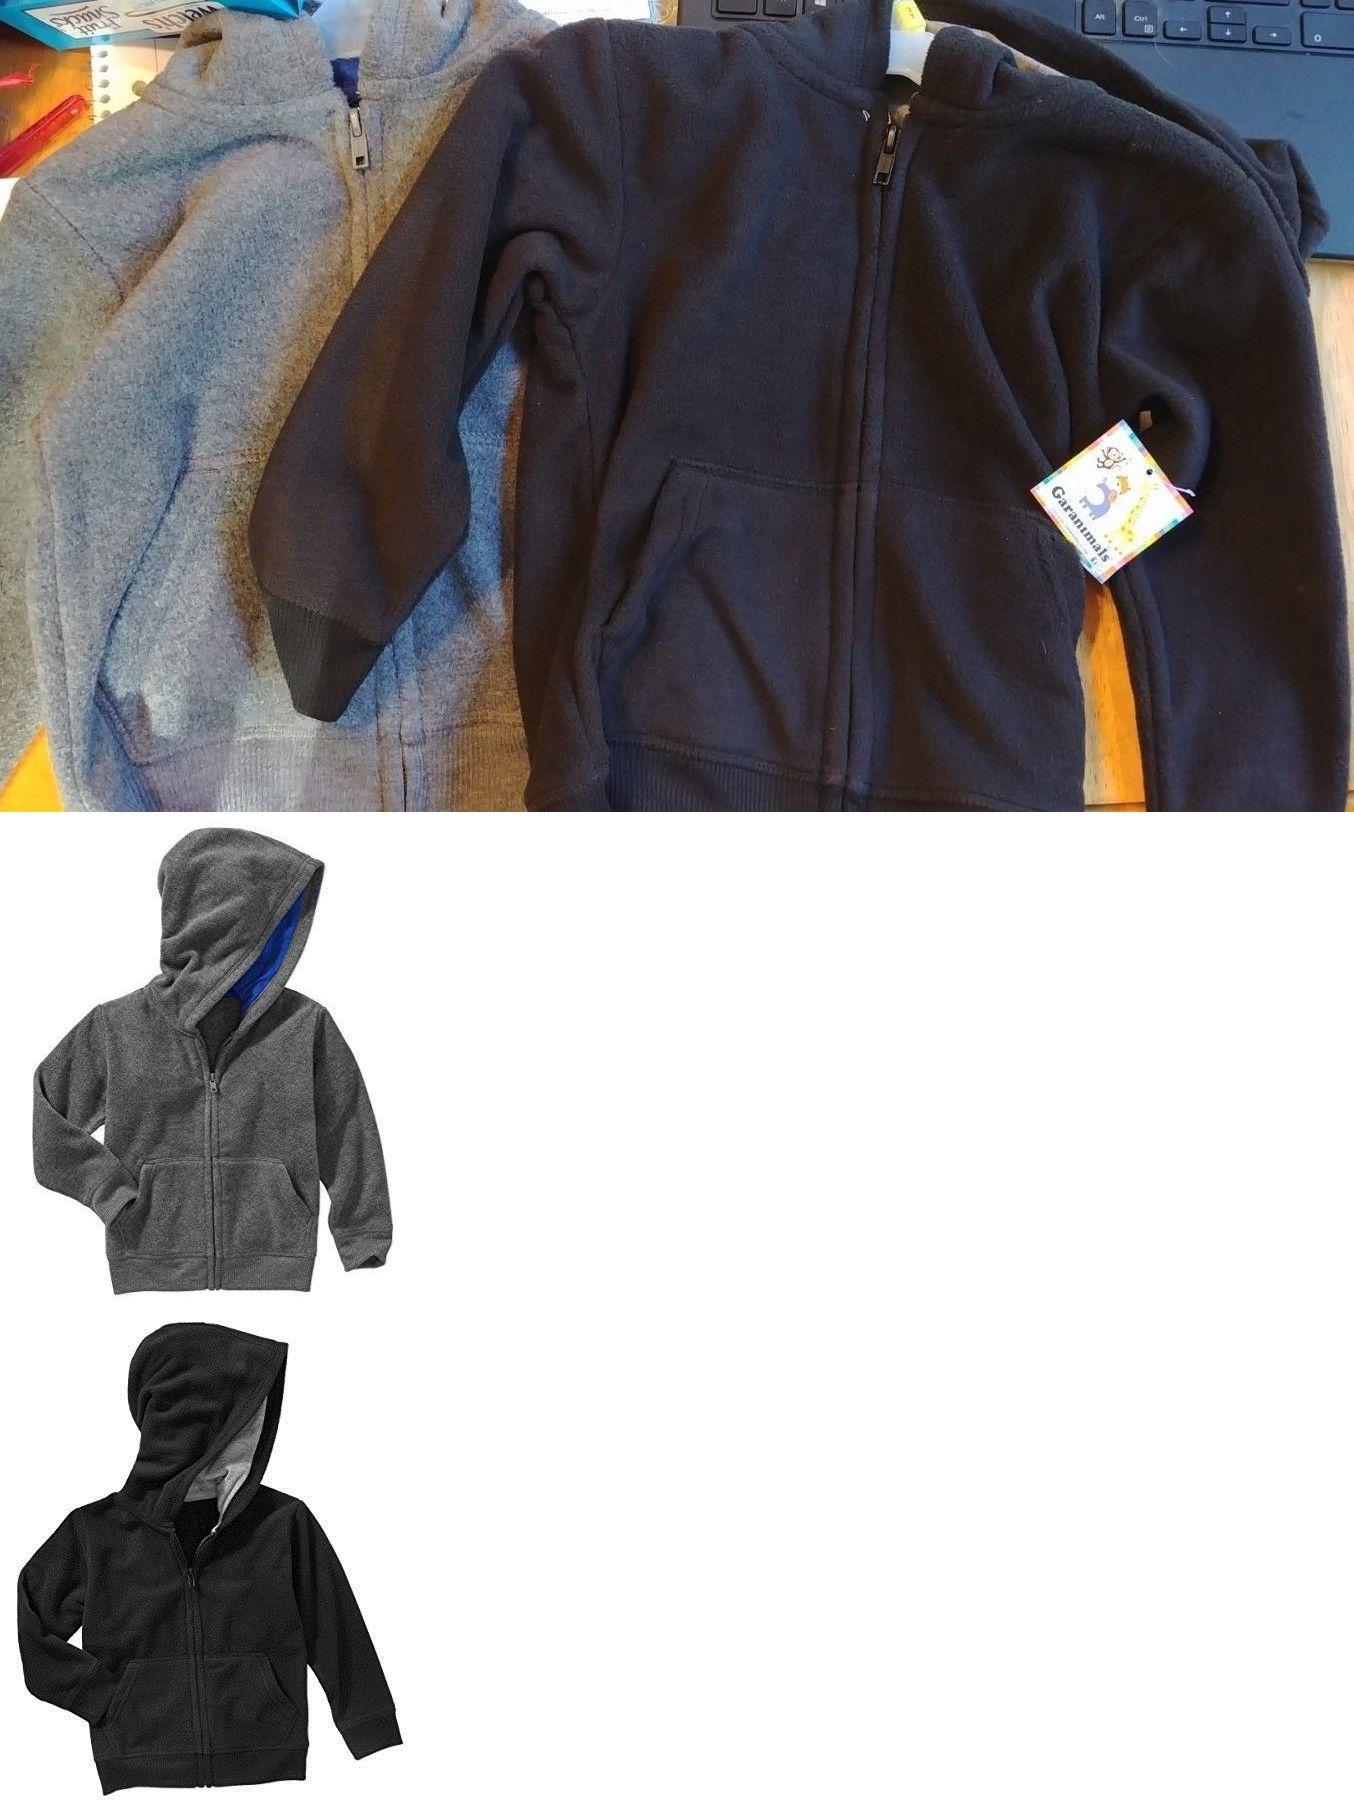 e1a7333562f9 Other Newborn-5T Boys Clothes 147343  Garanimals 12M -5T Girls Boys ...